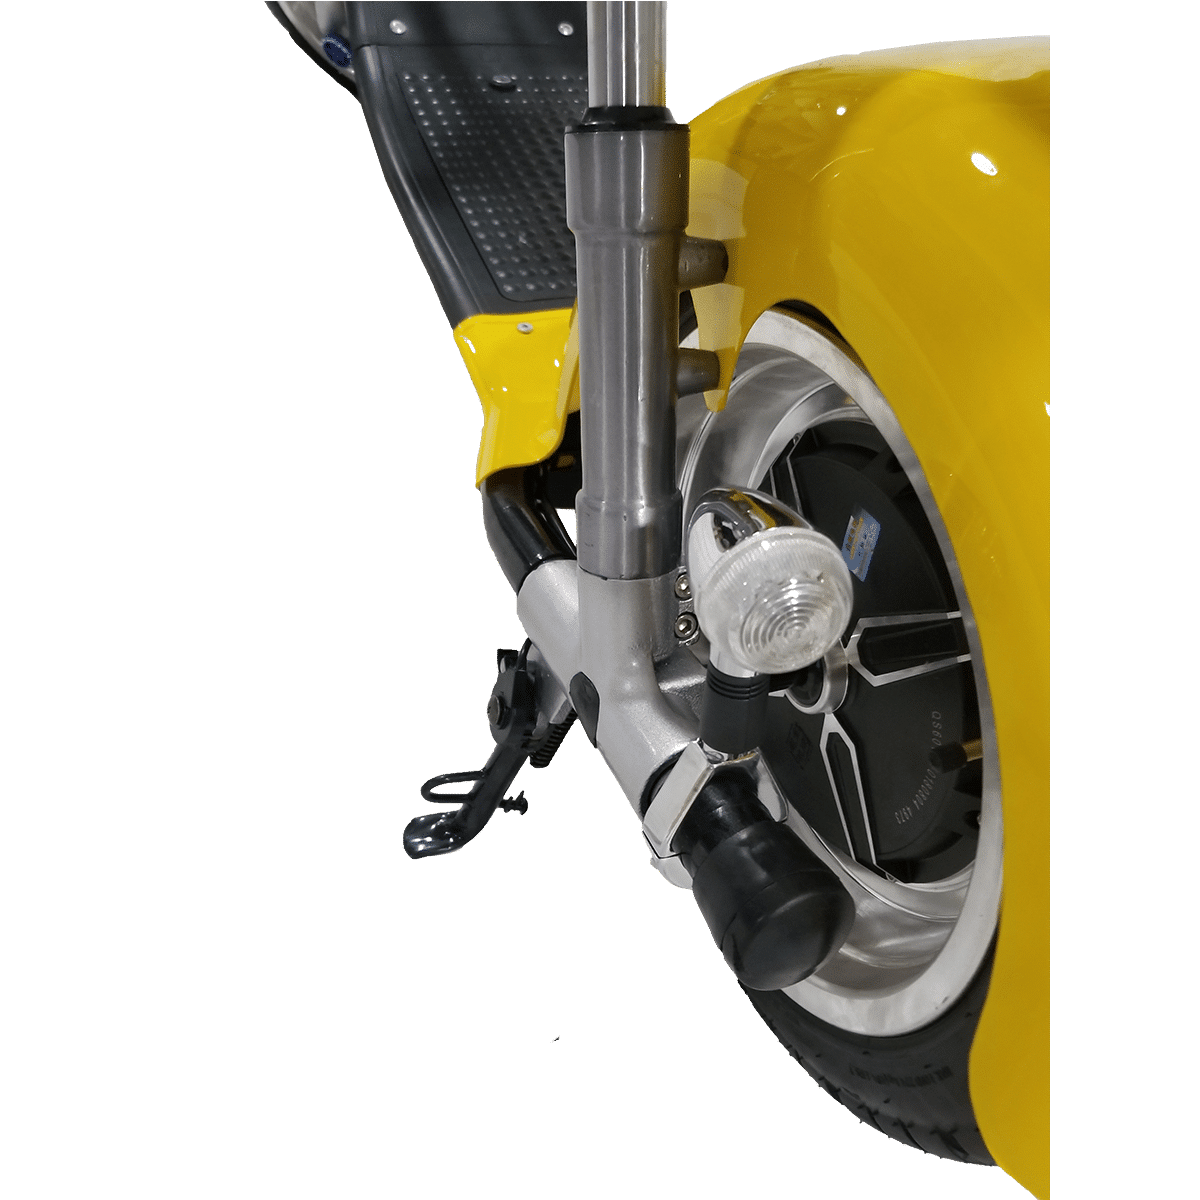 Citycoco Harley Deluxe Jaune avec 1 batterie offerte en plus 13